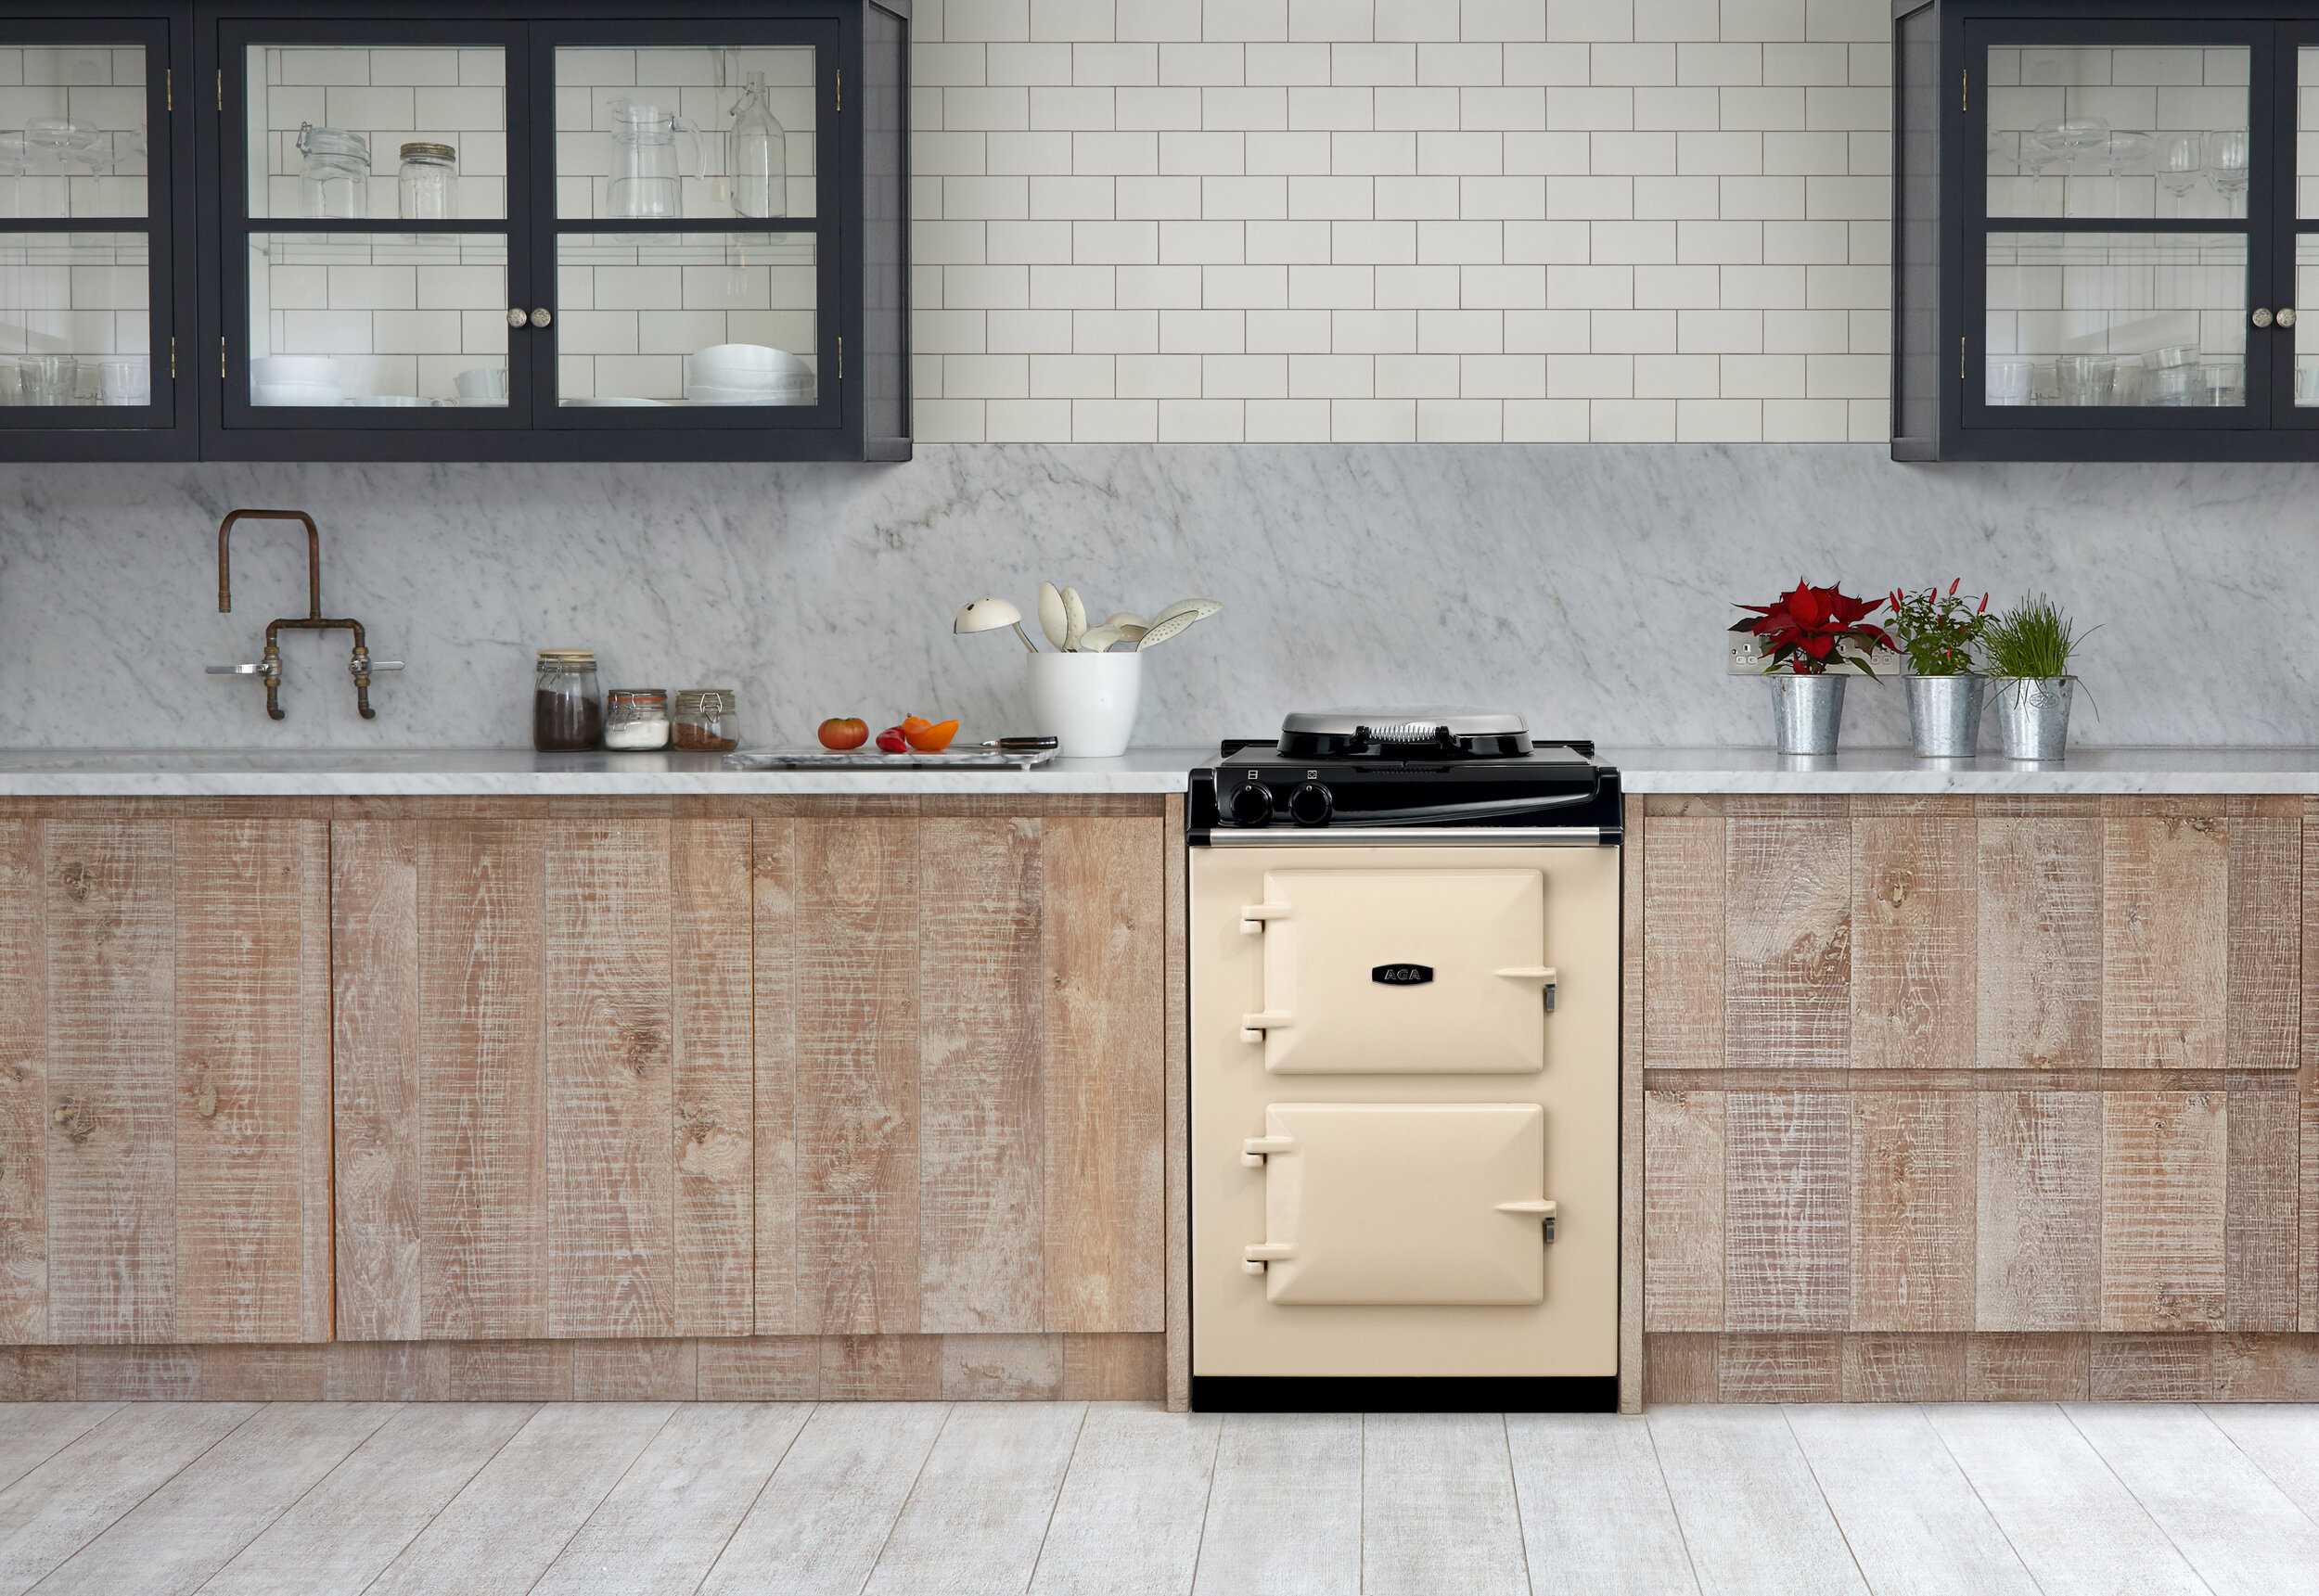 Aga Australia Aga Cookers Falcon Ovens Rayburn Solid Fuel Wood Stoves Liebherr Fridges Qasair Rangehoods